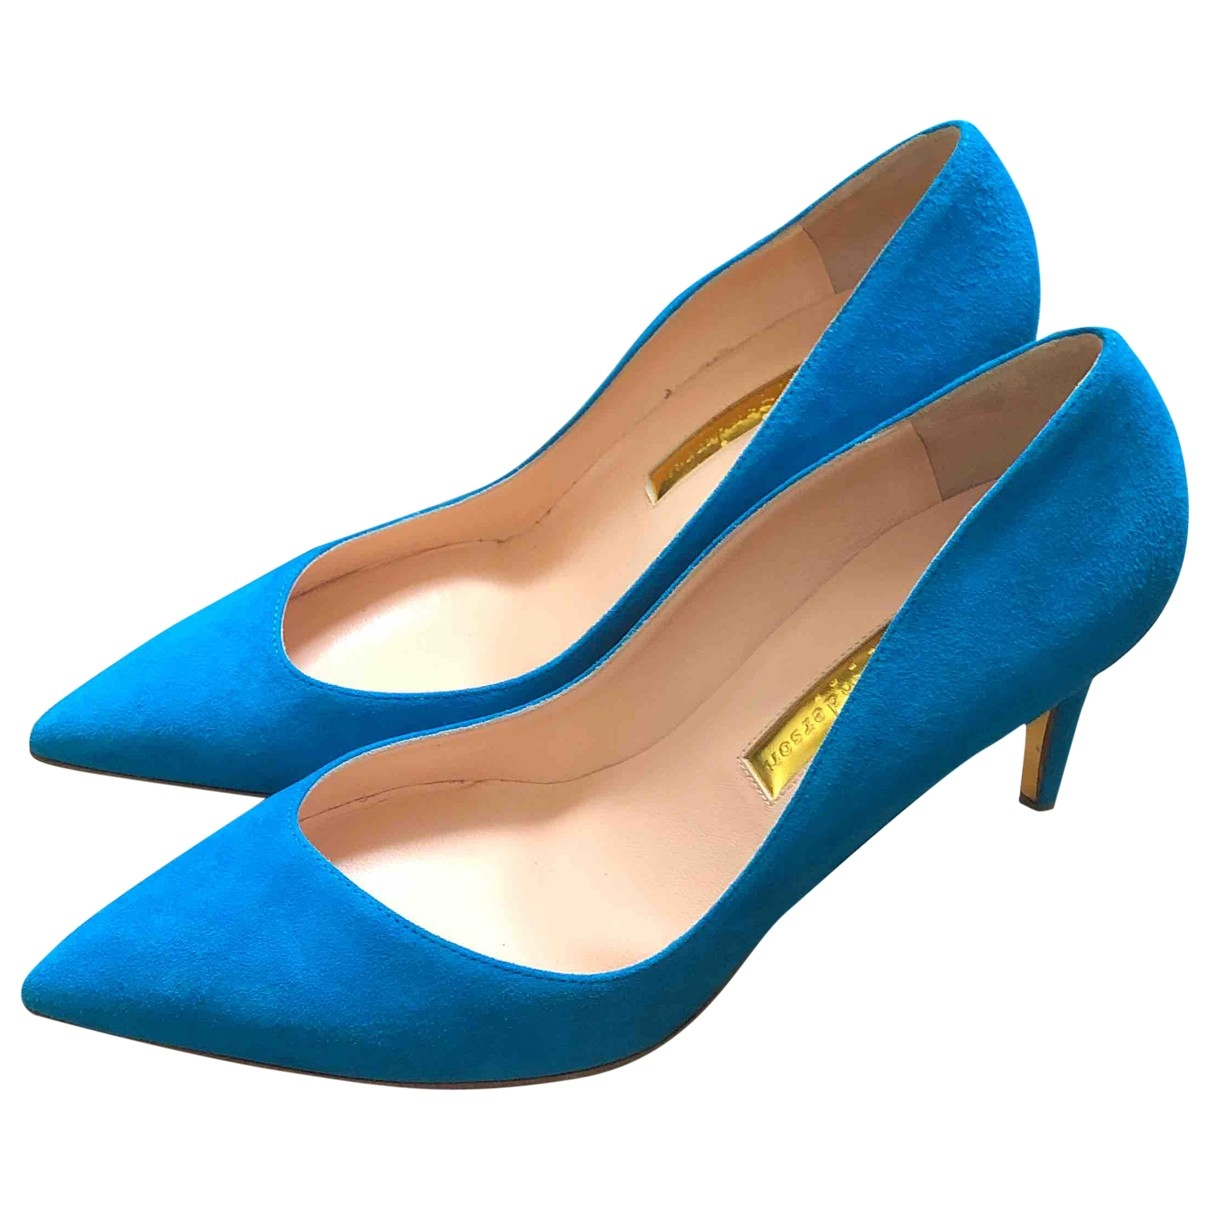 Rupert Sanderson \N Turquoise Suede Heels for Women 39 EU